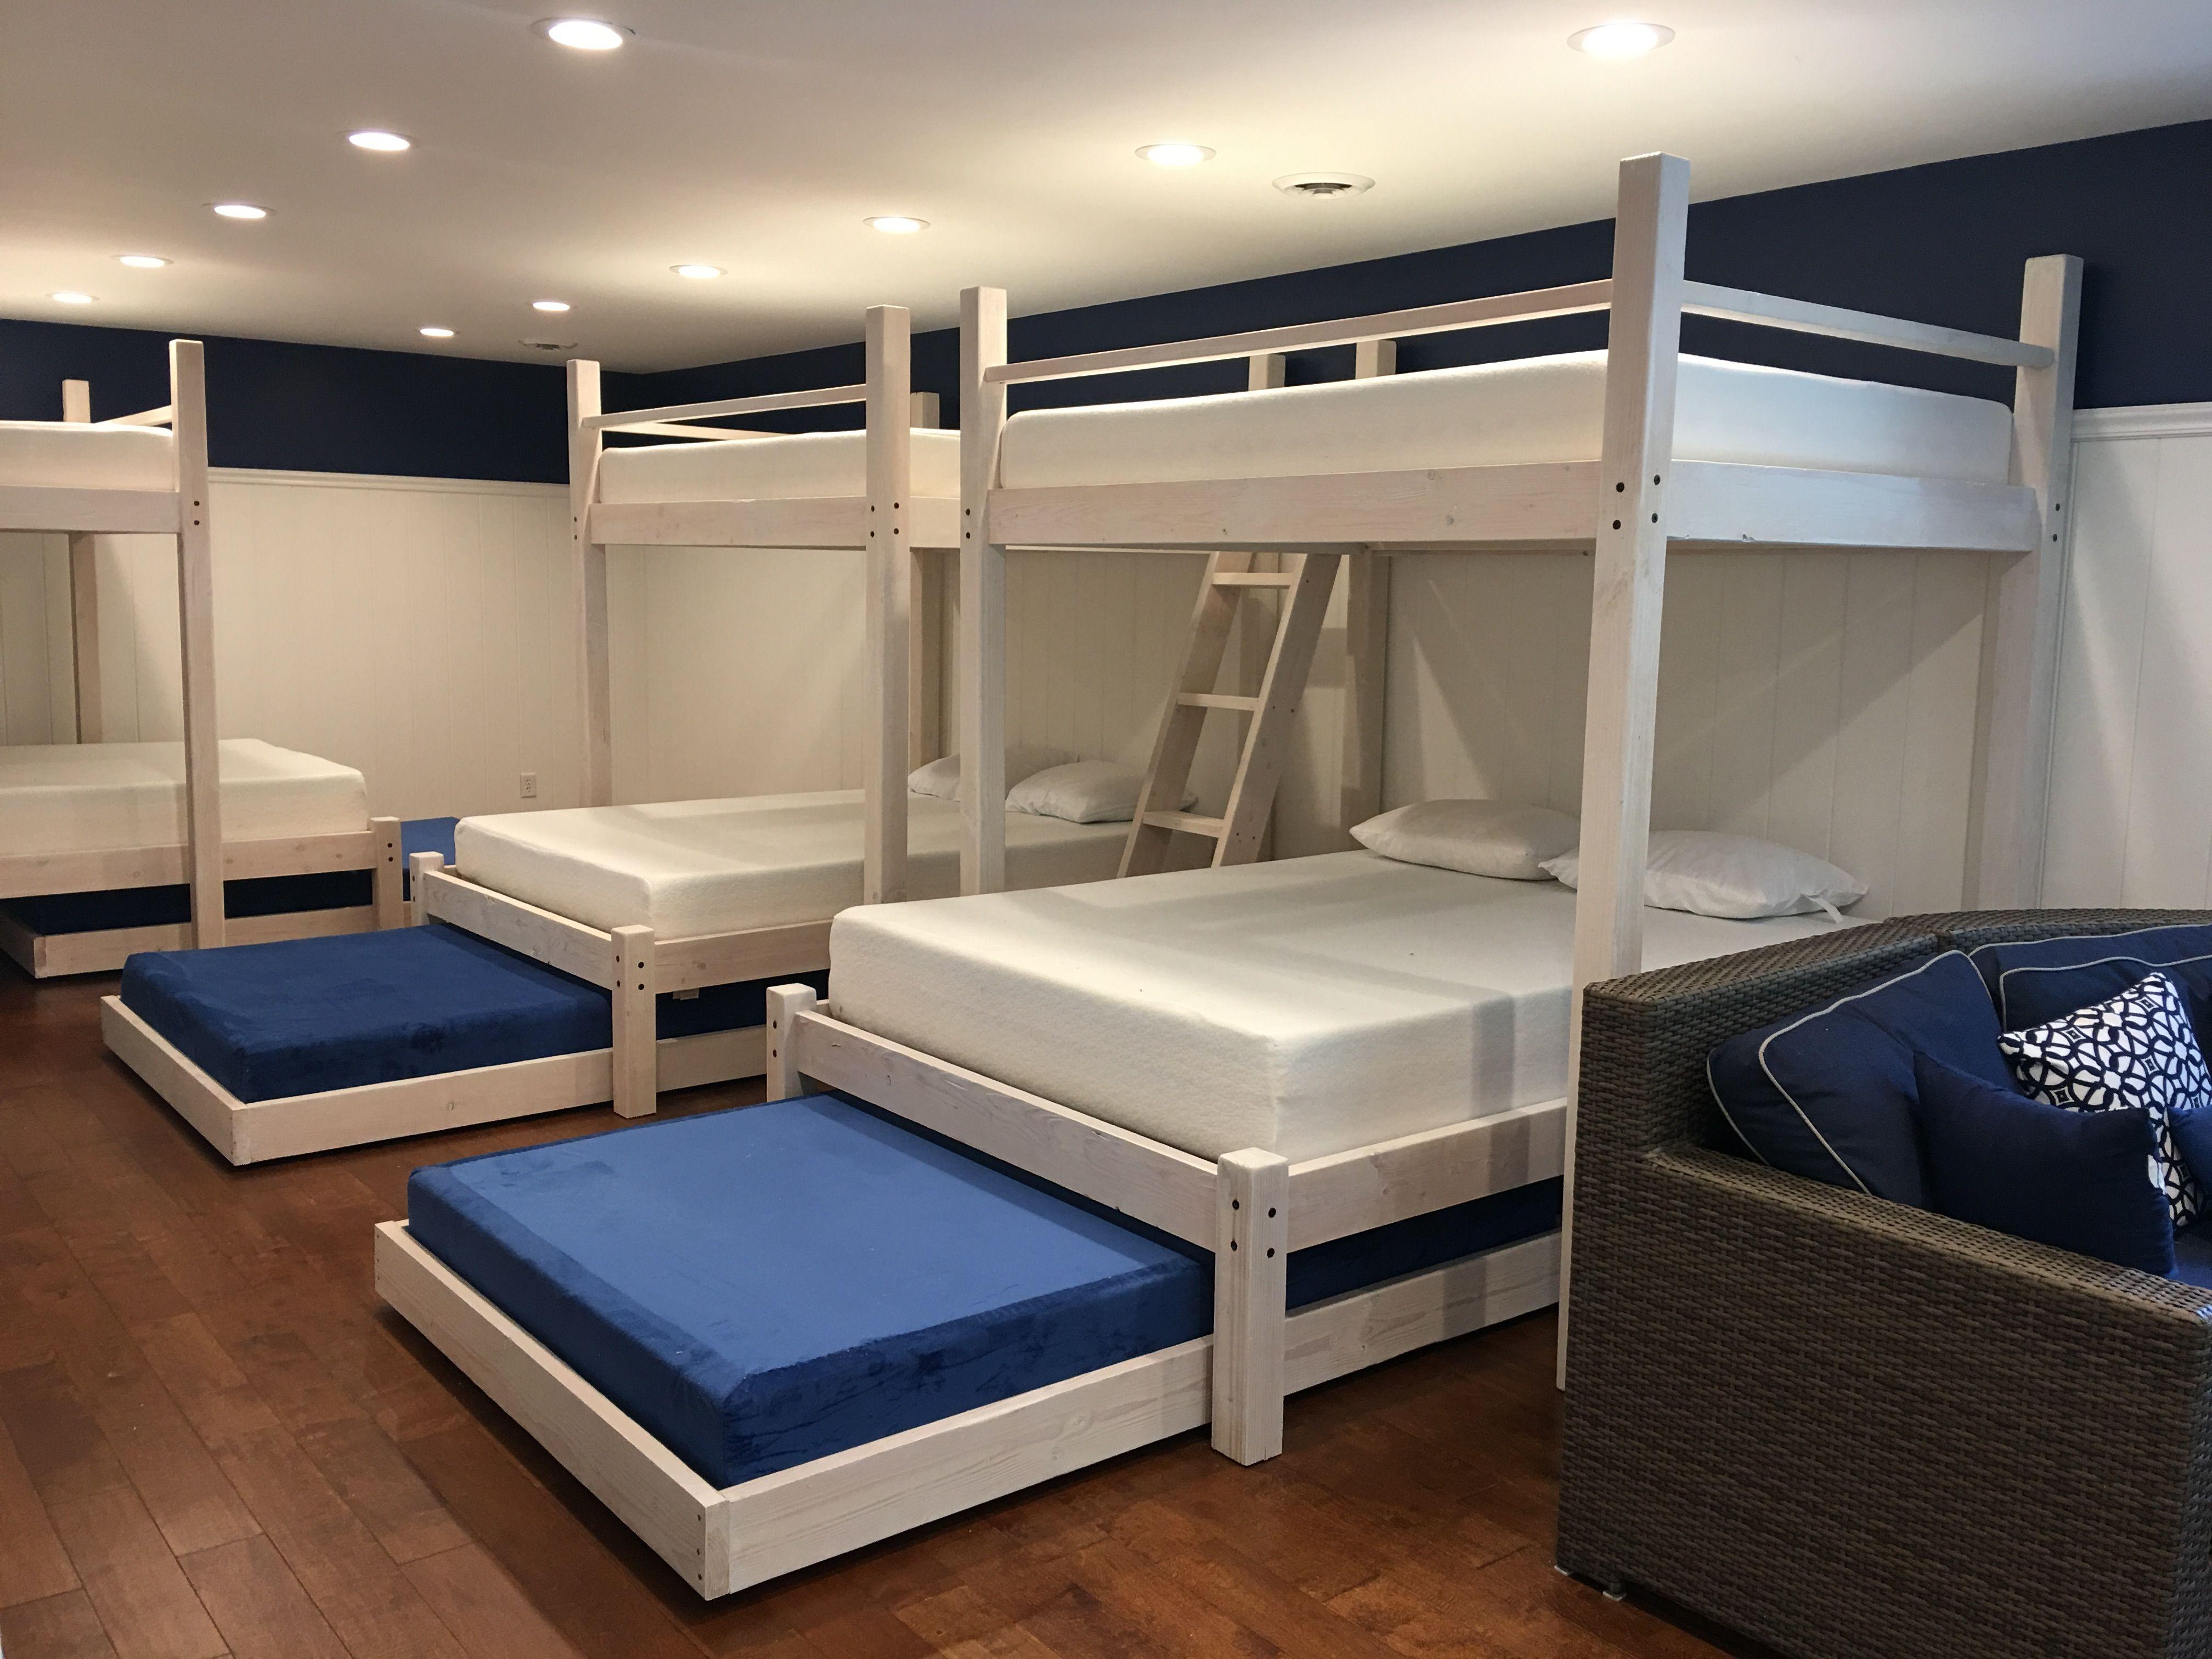 Lake House Bunk Room In 2019 Bunk Bed Rooms Custom Bunk